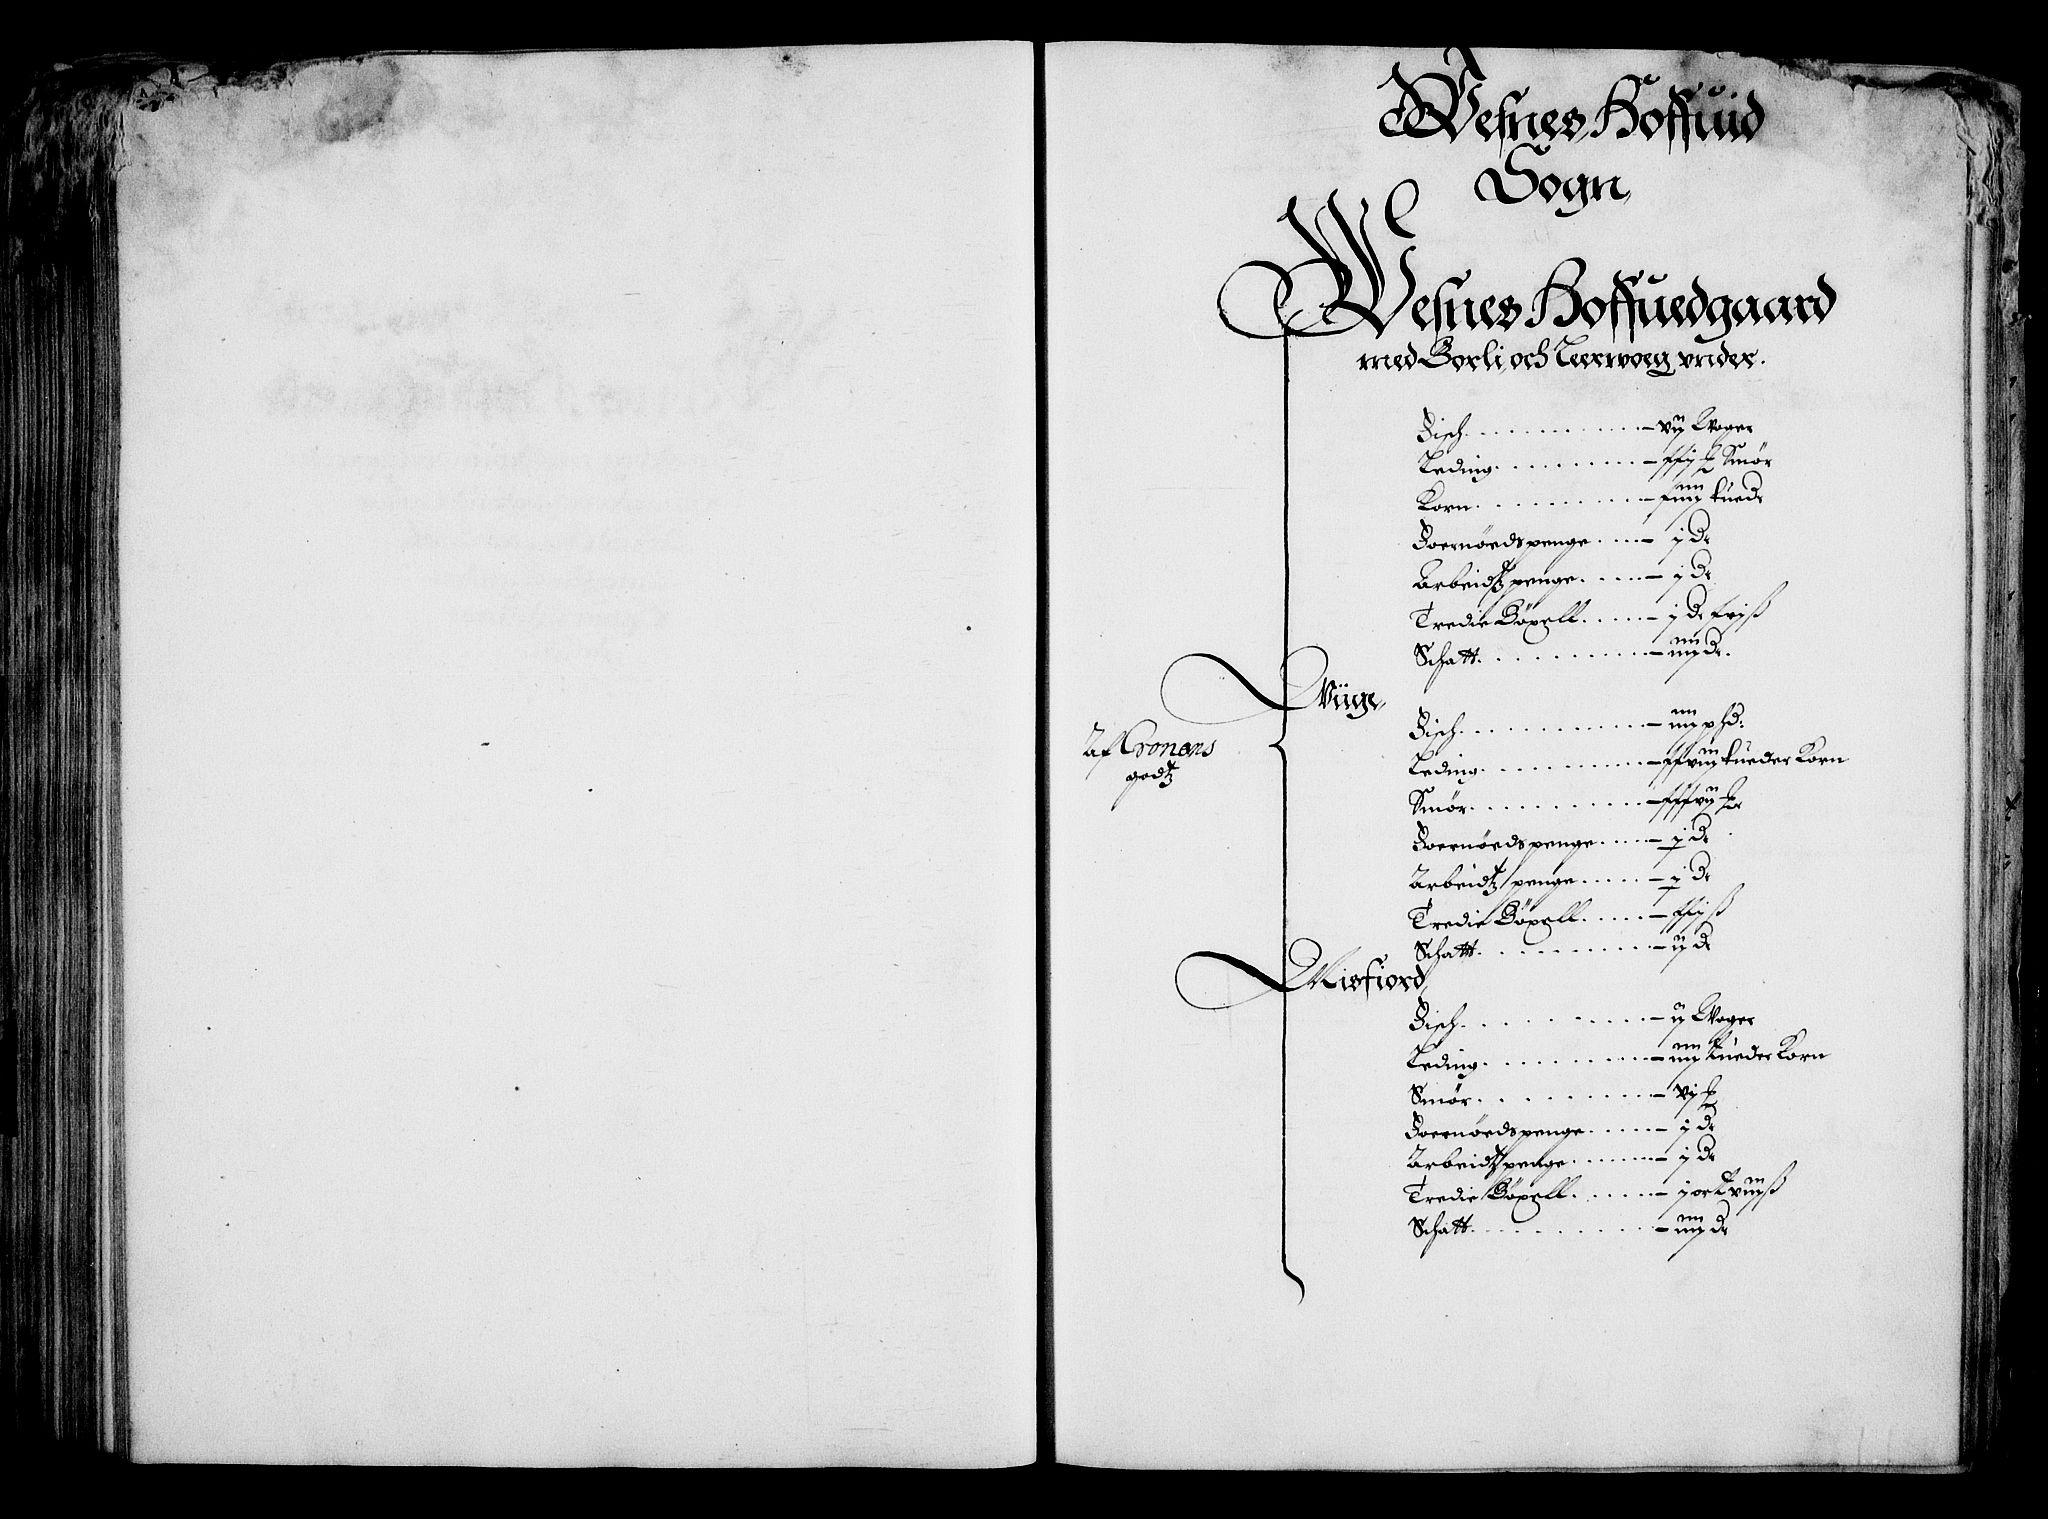 RA, Rentekammeret inntil 1814, Realistisk ordnet avdeling, On/L0001: Statens gods, 1651, s. 202